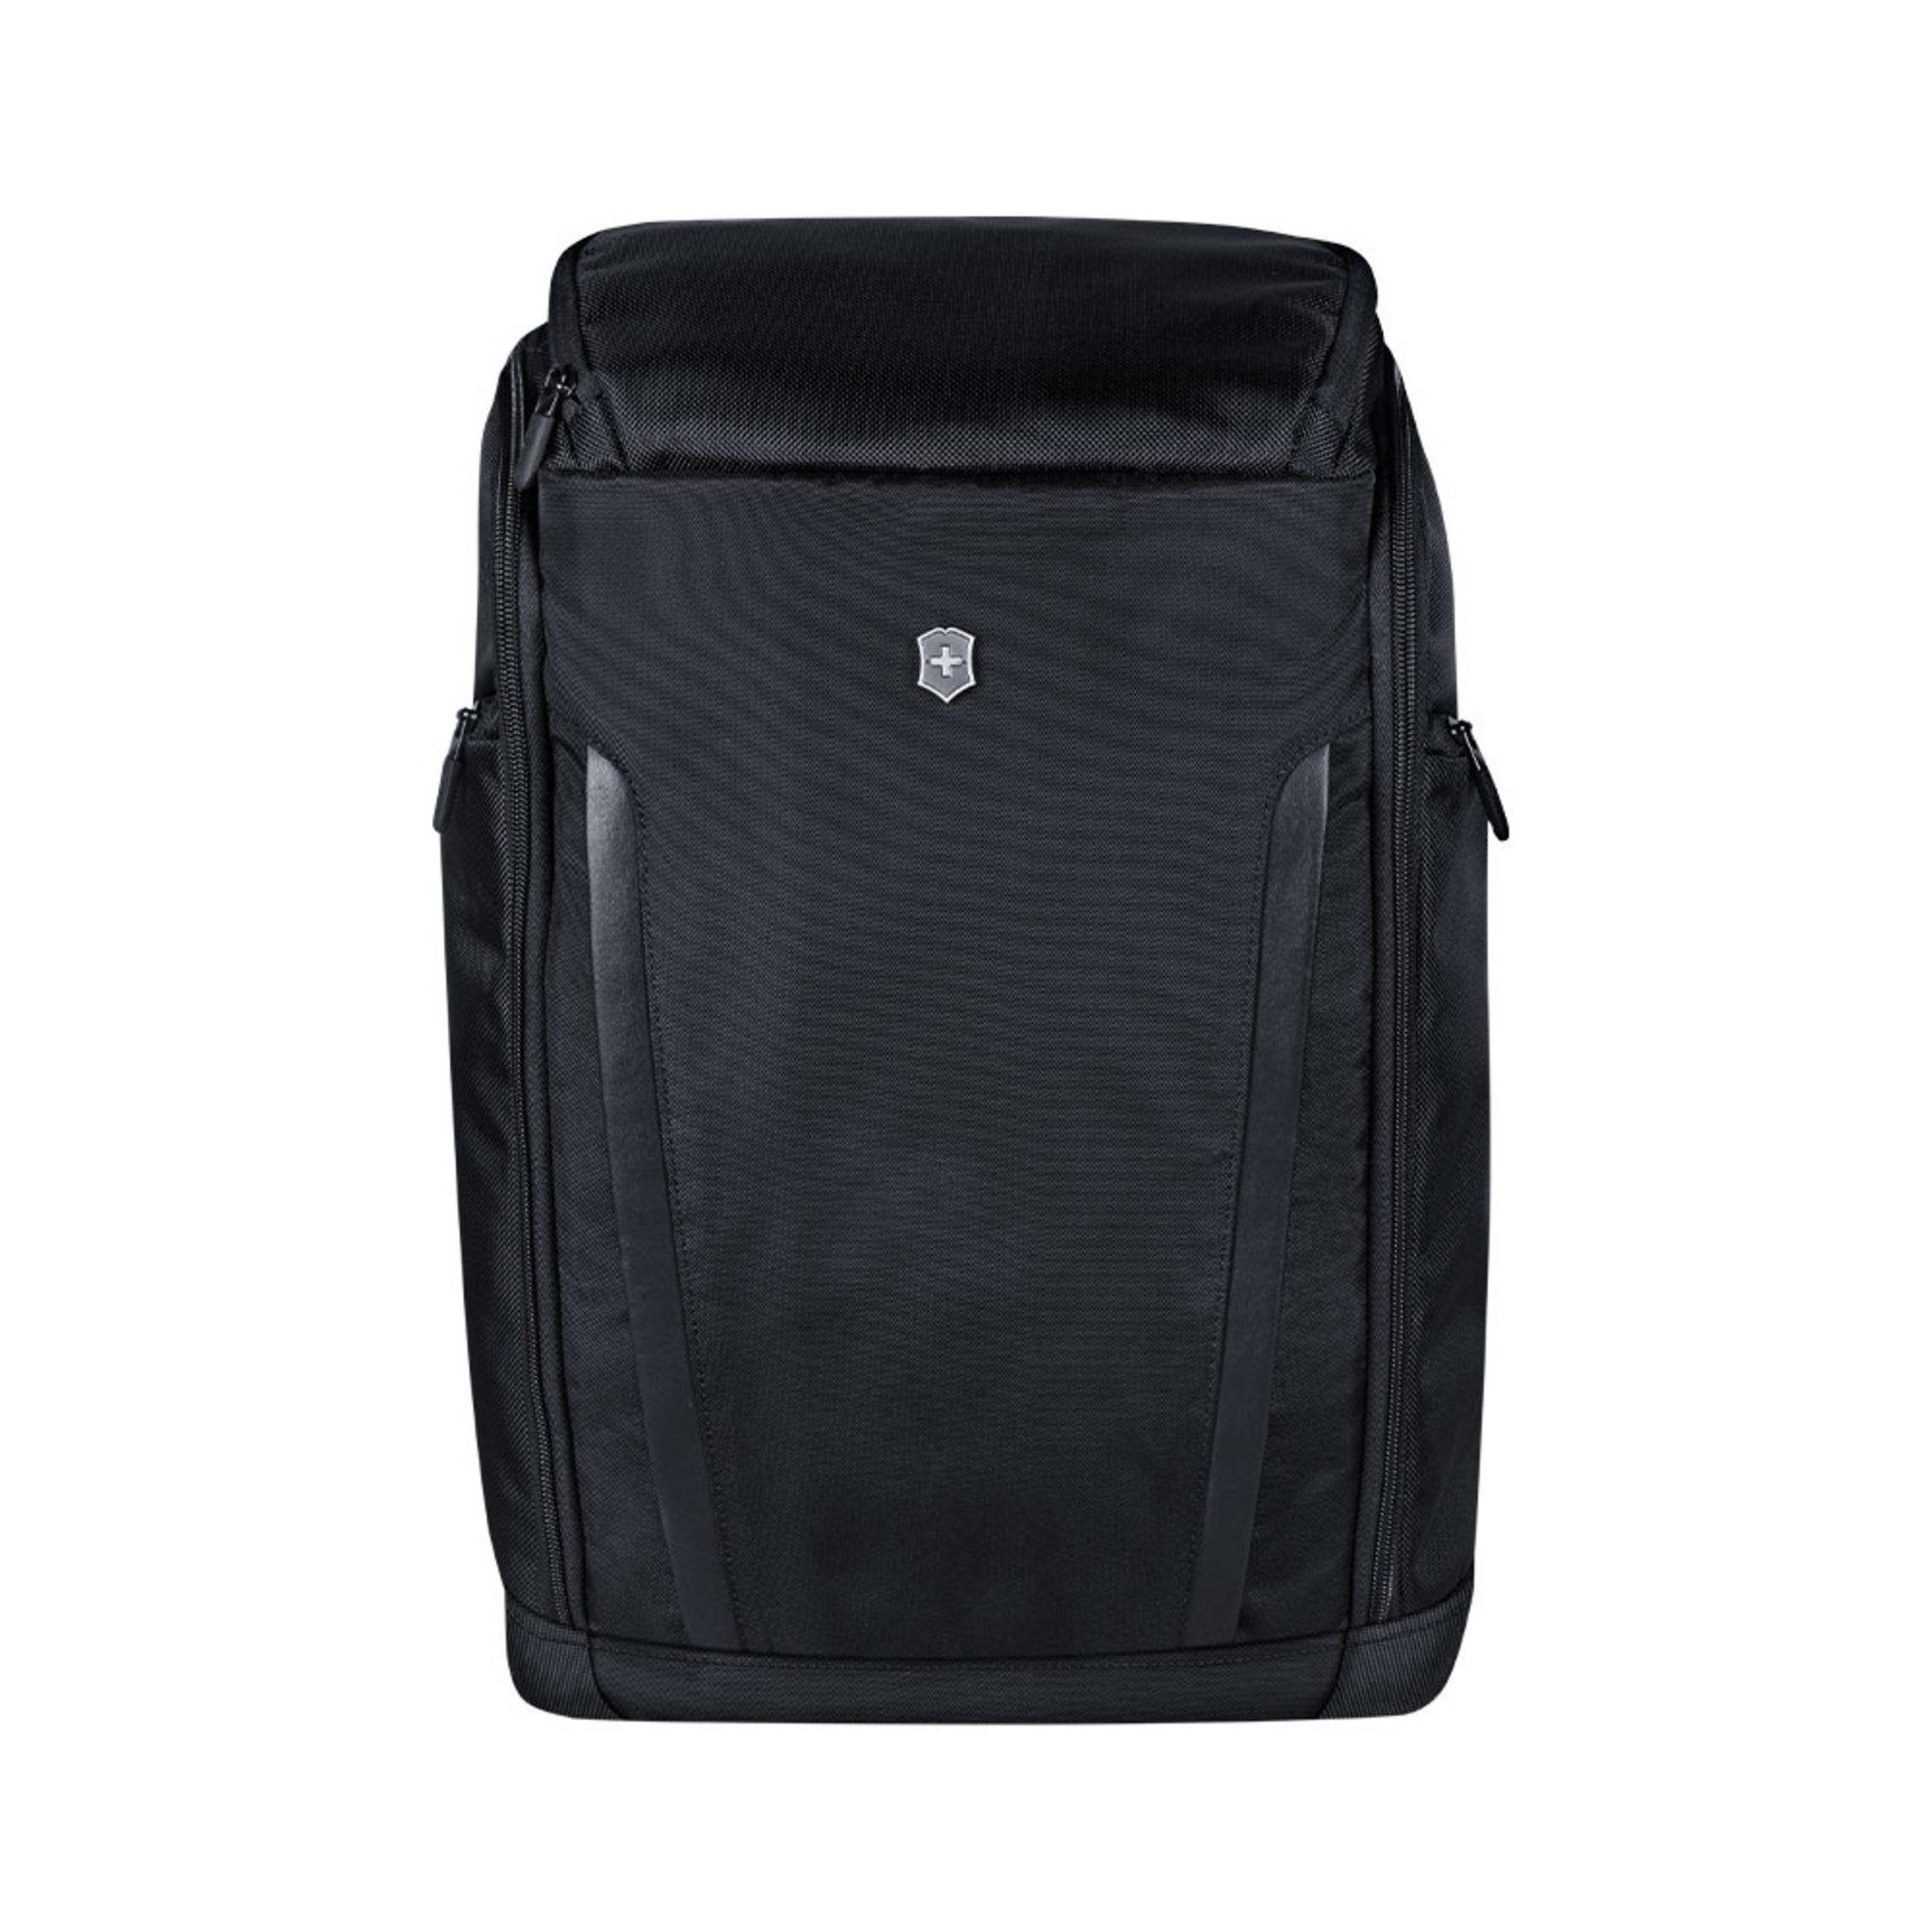 Ryggsäck, Fliptop Laptop Backpack, svart